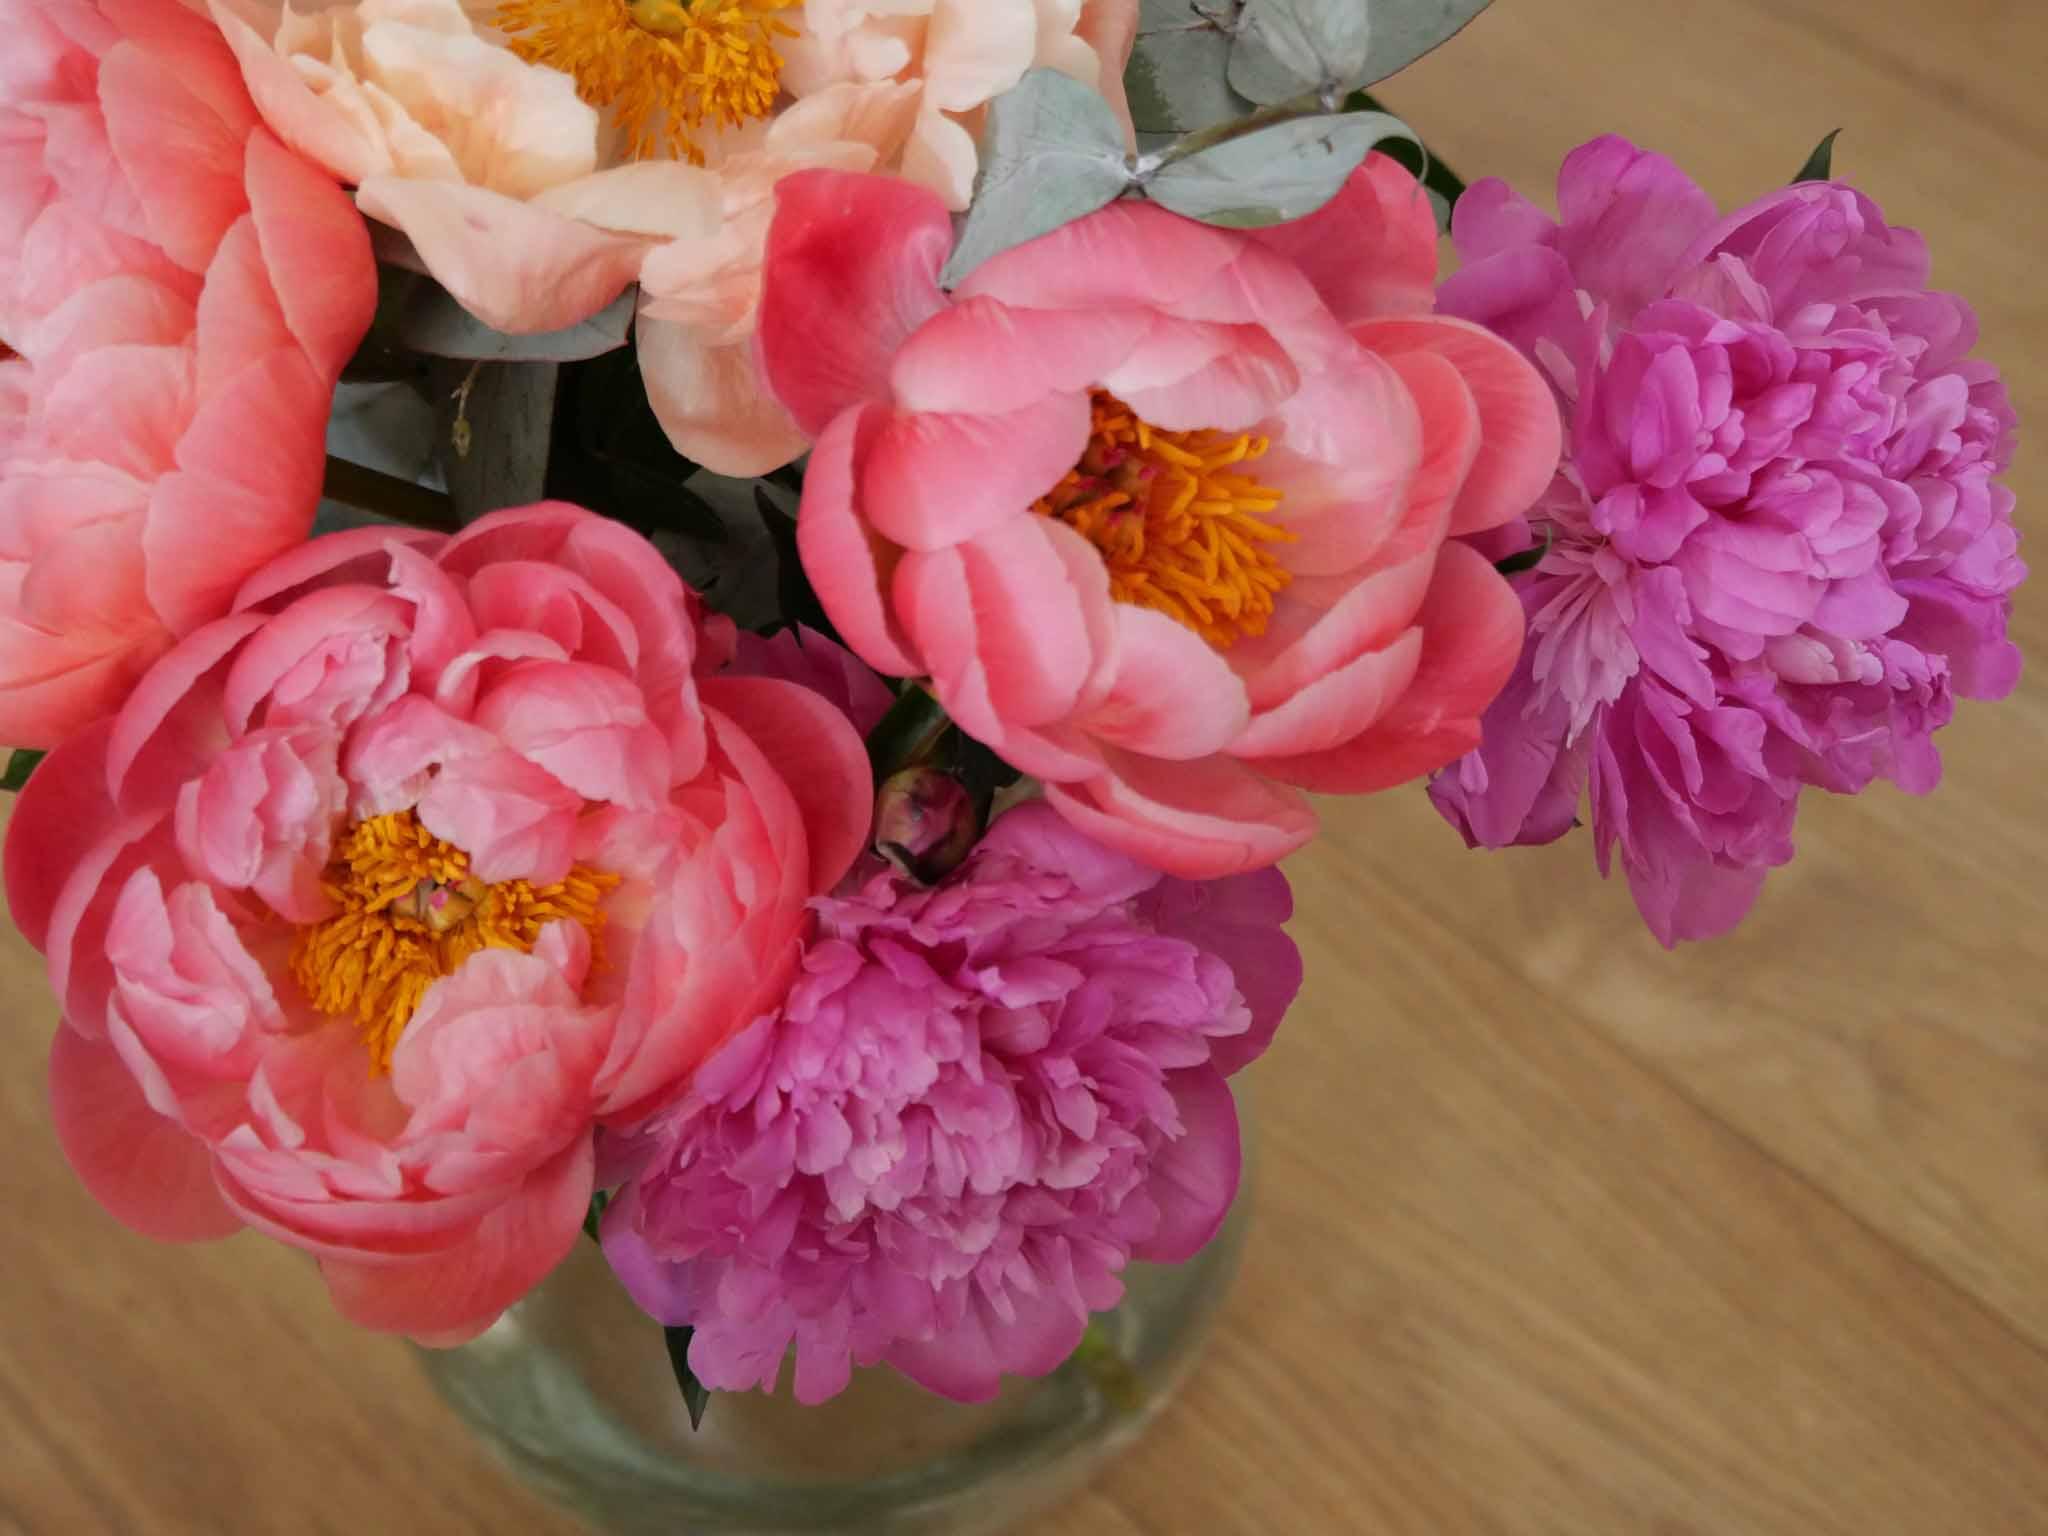 Pivoines camaieu de roses